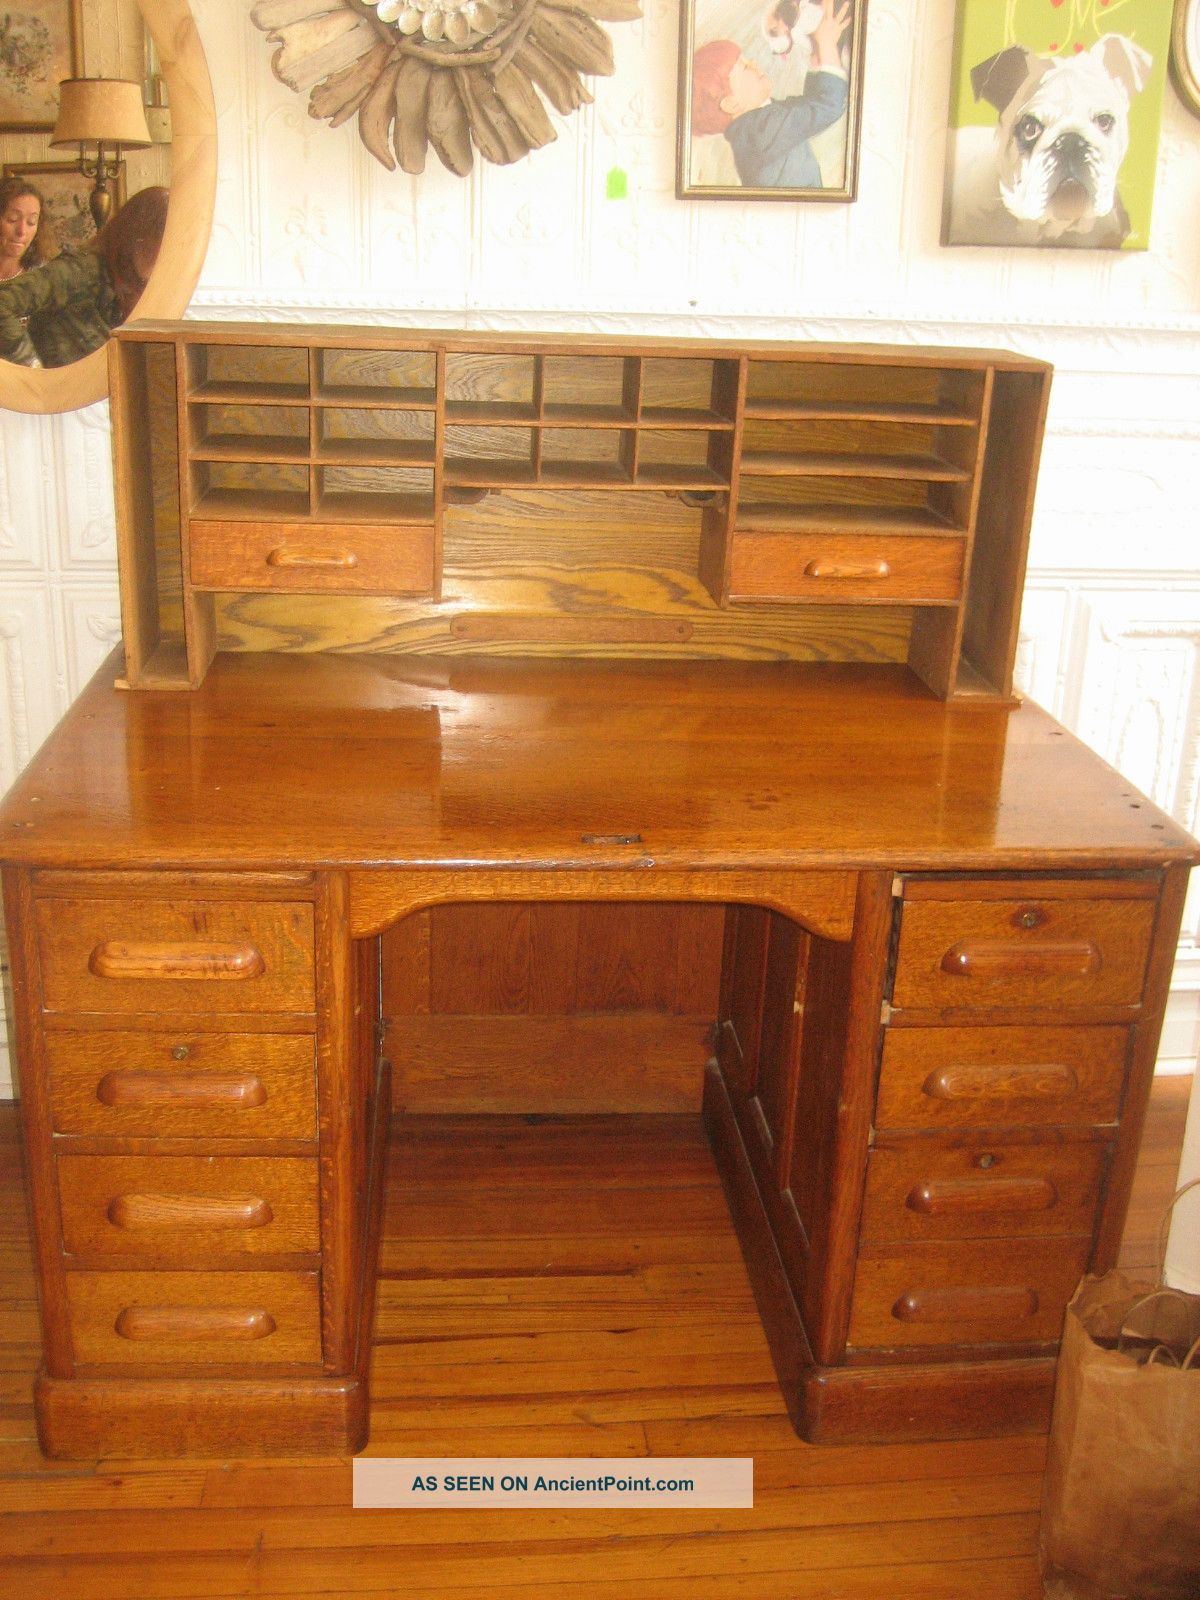 Antique Circa 1900 ' S Roll Top Desk 1900-1950 photo